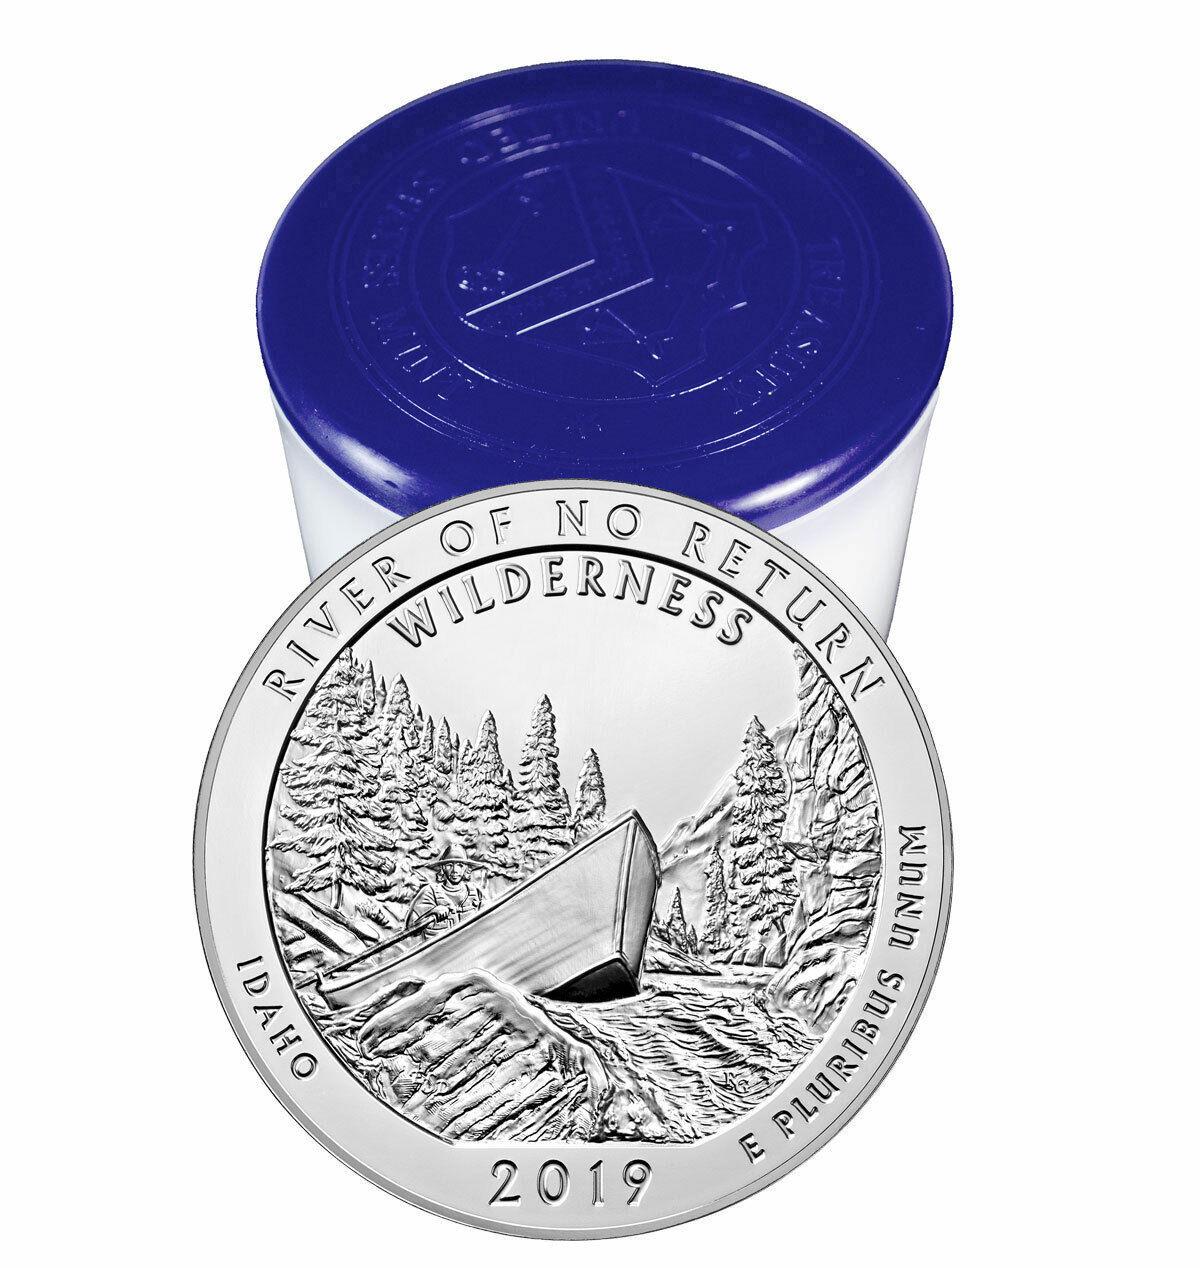 Lot of 10-2019-P Australia Silver Kangaroo $1 Coins SKU55523